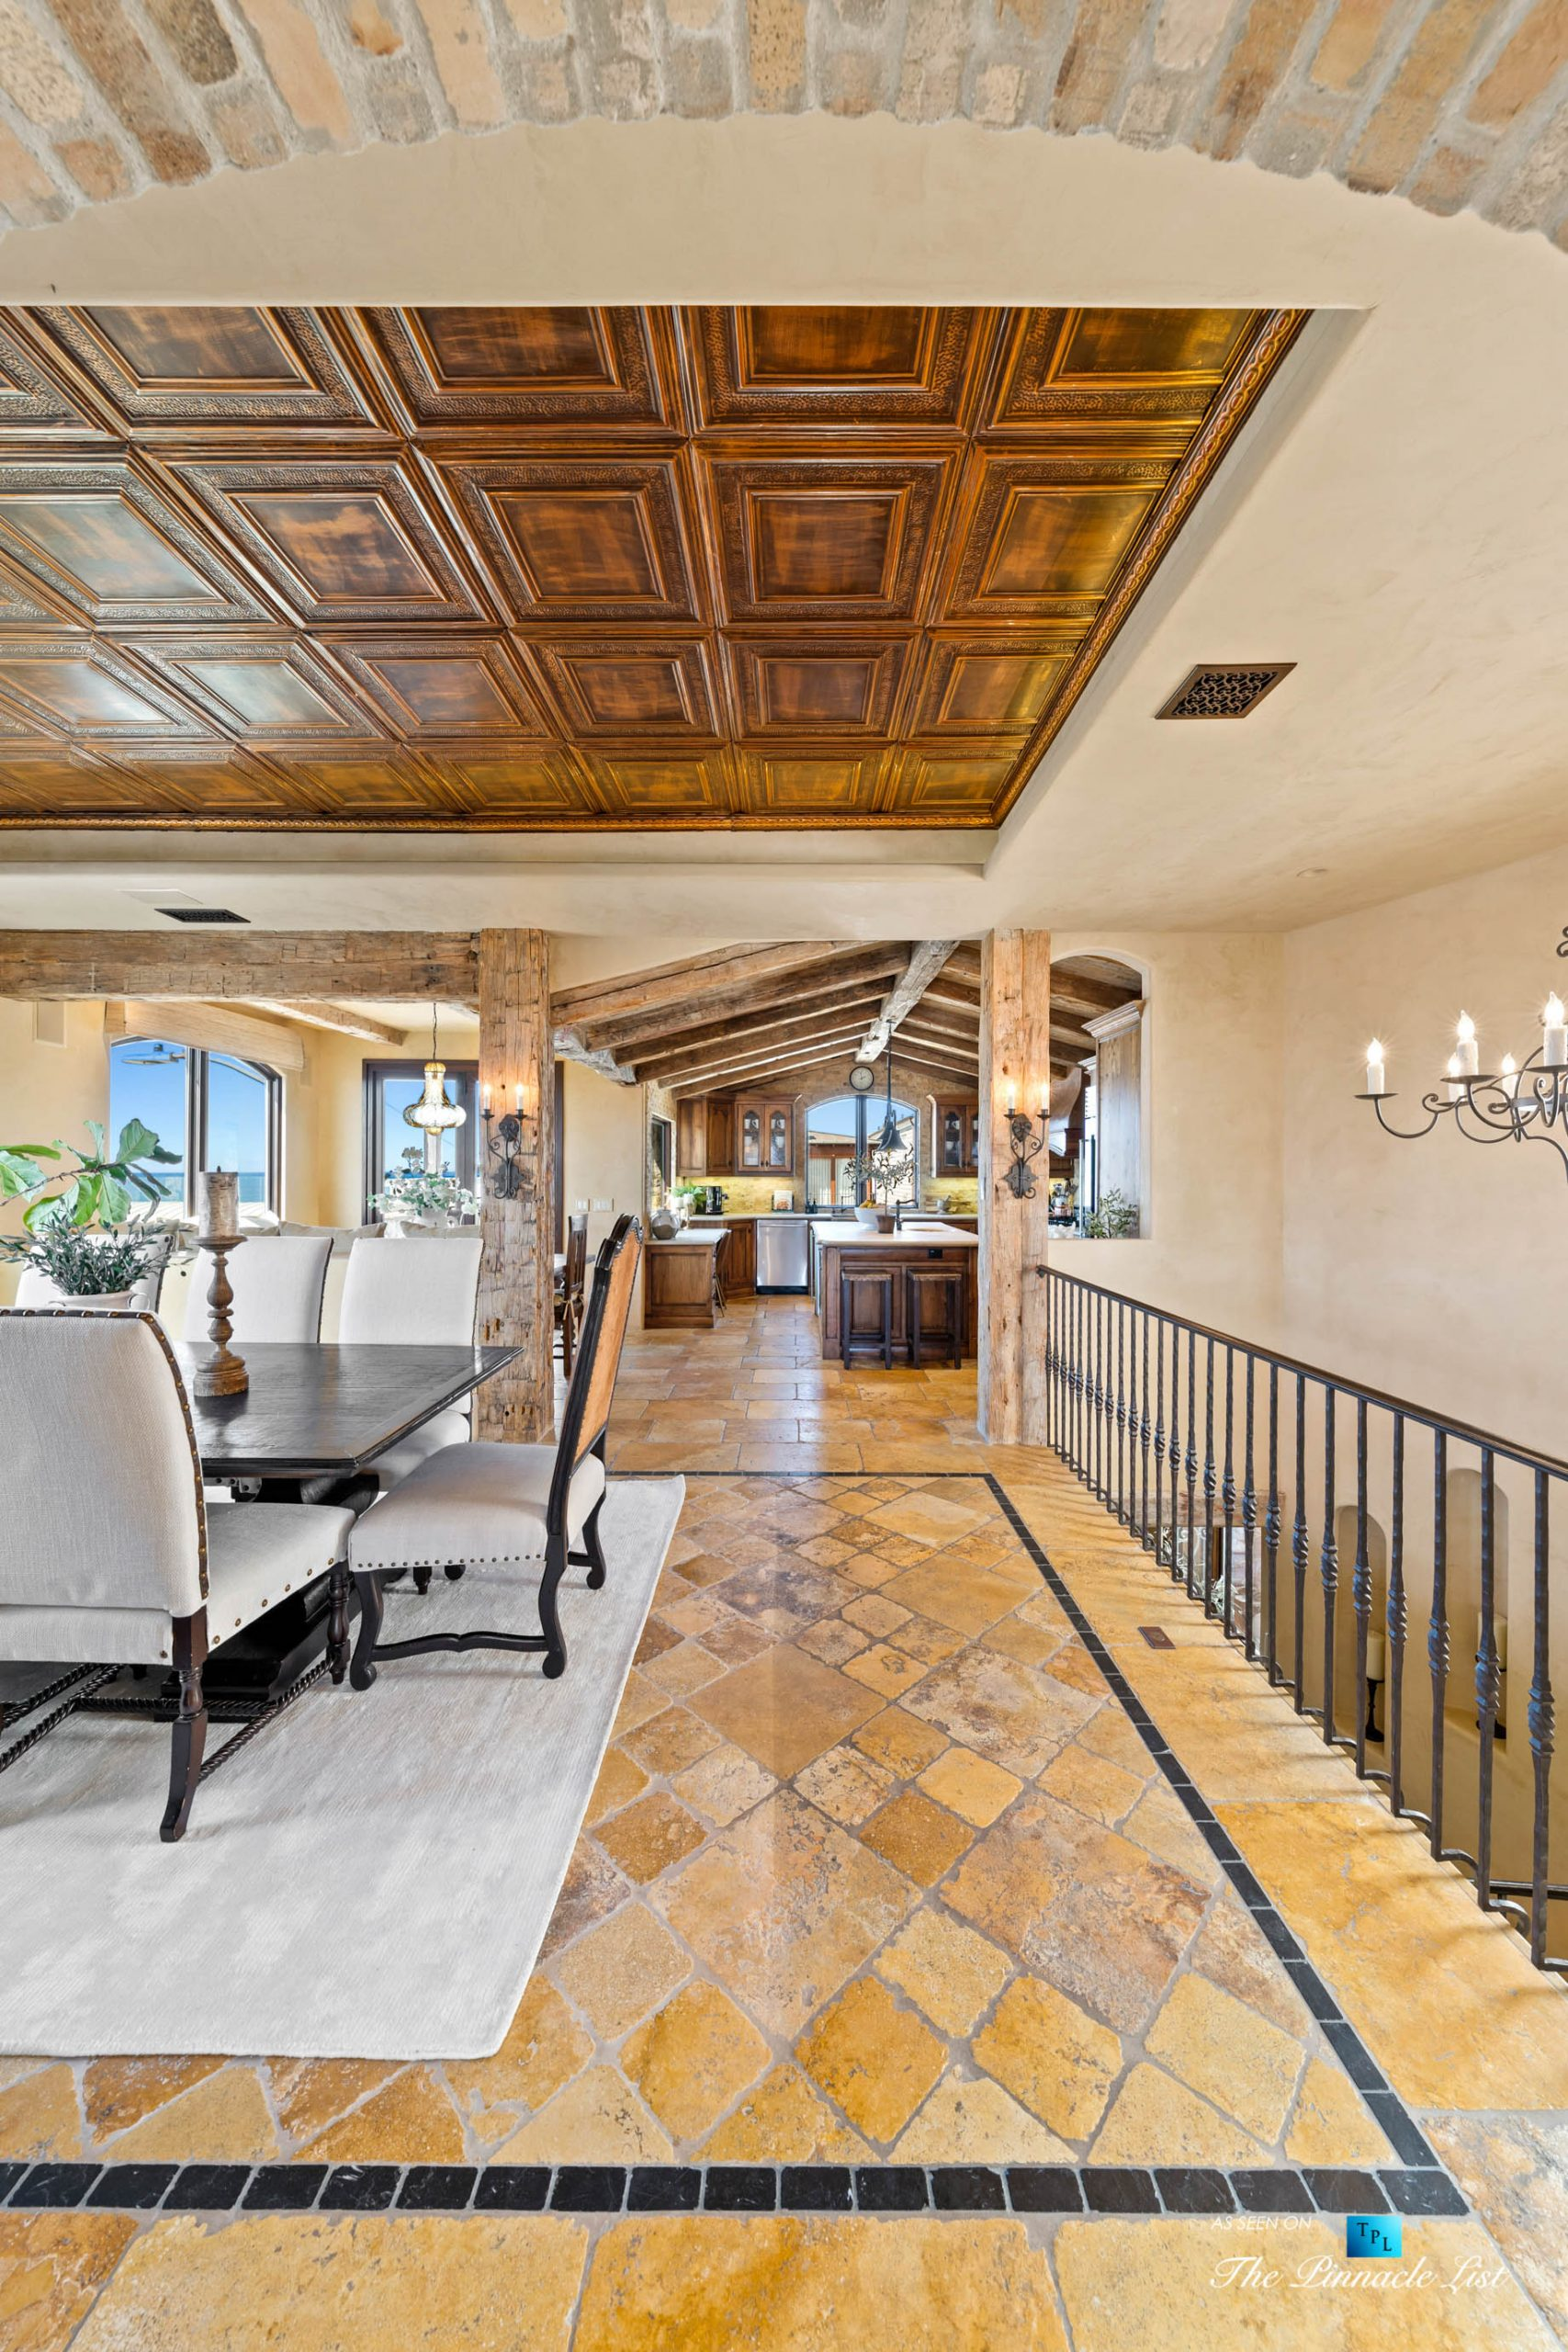 216 7th St, Manhattan Beach, CA, USA – Luxury Real Estate – Coastal Villa Home – Dining Room and Kitchen